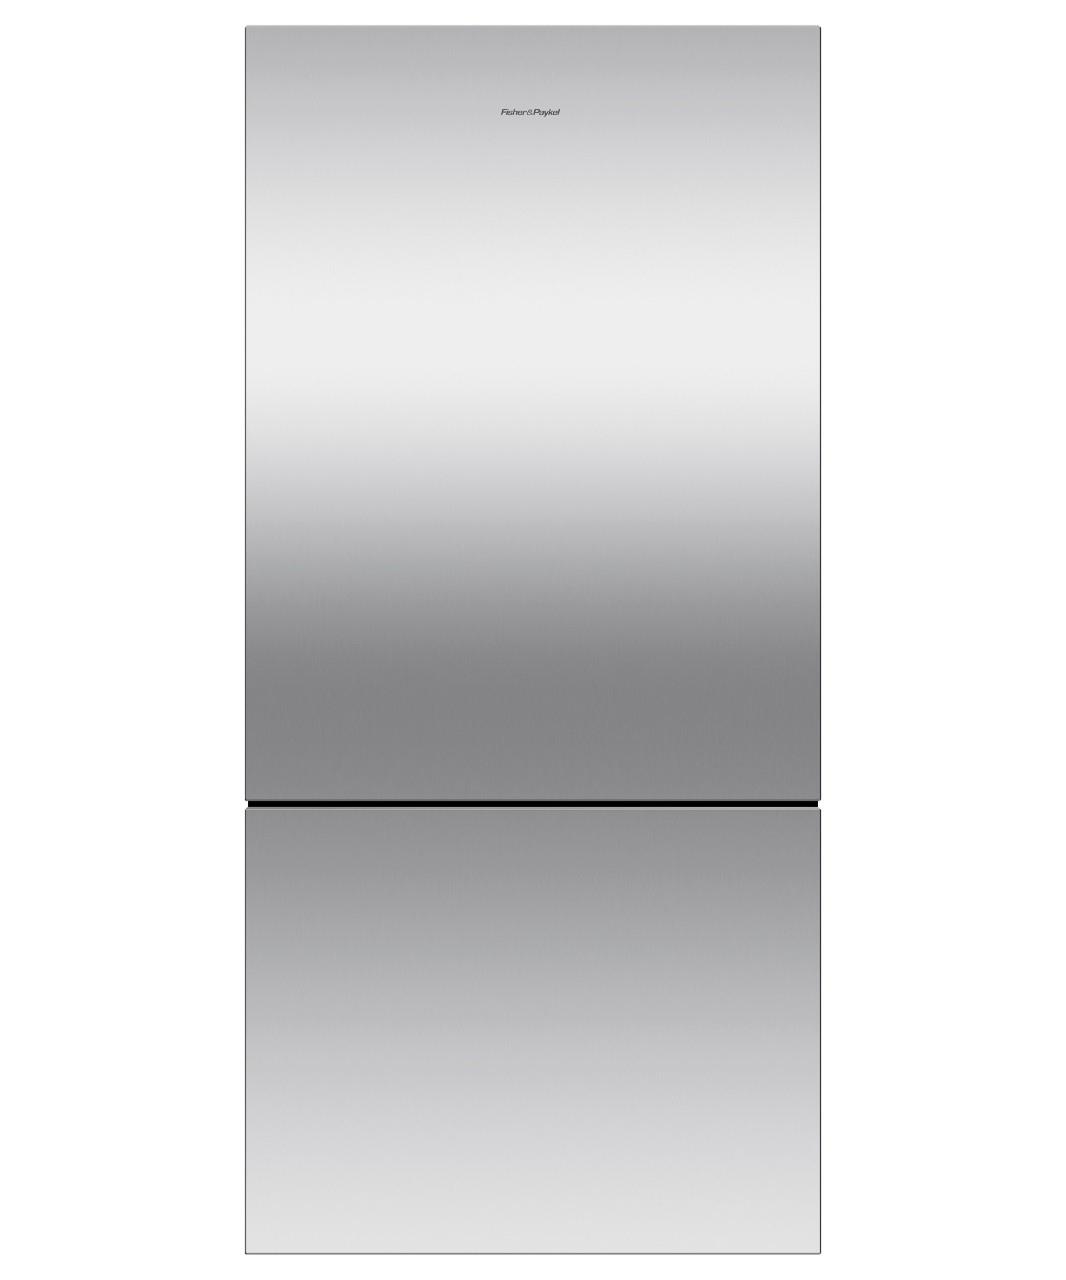 Fisher & Paykel RF522BLPX6 ActiveSmart™ Fridge Freezer Stainless Steel